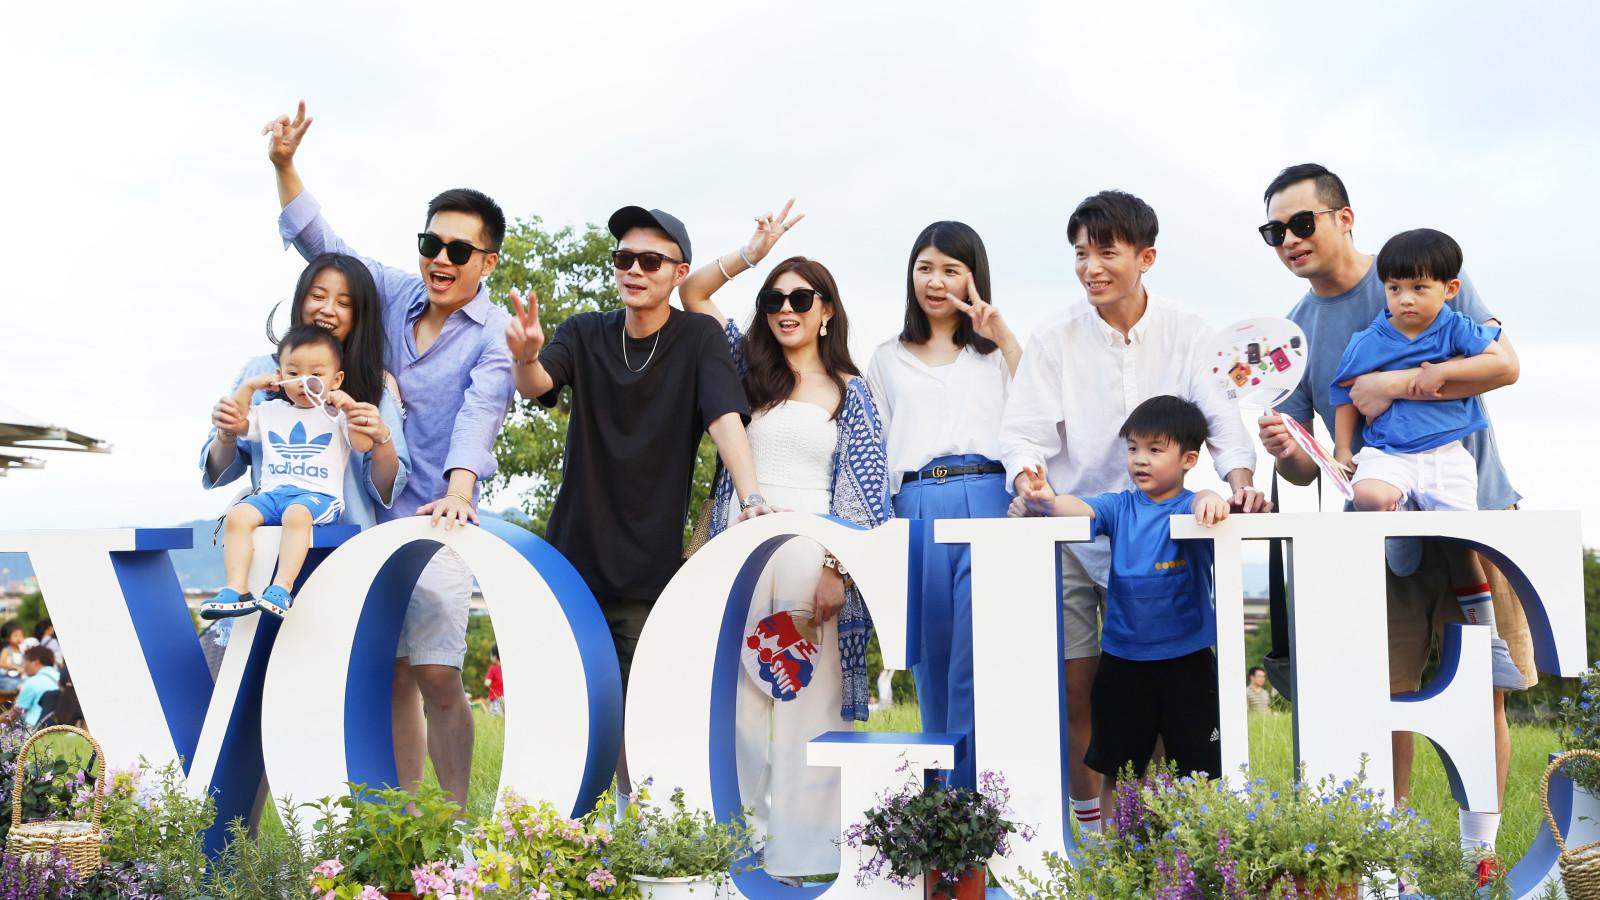 Vogue Picnic 3 - giles.heasman(何家樂) - Taiwan - Vogue Picnic